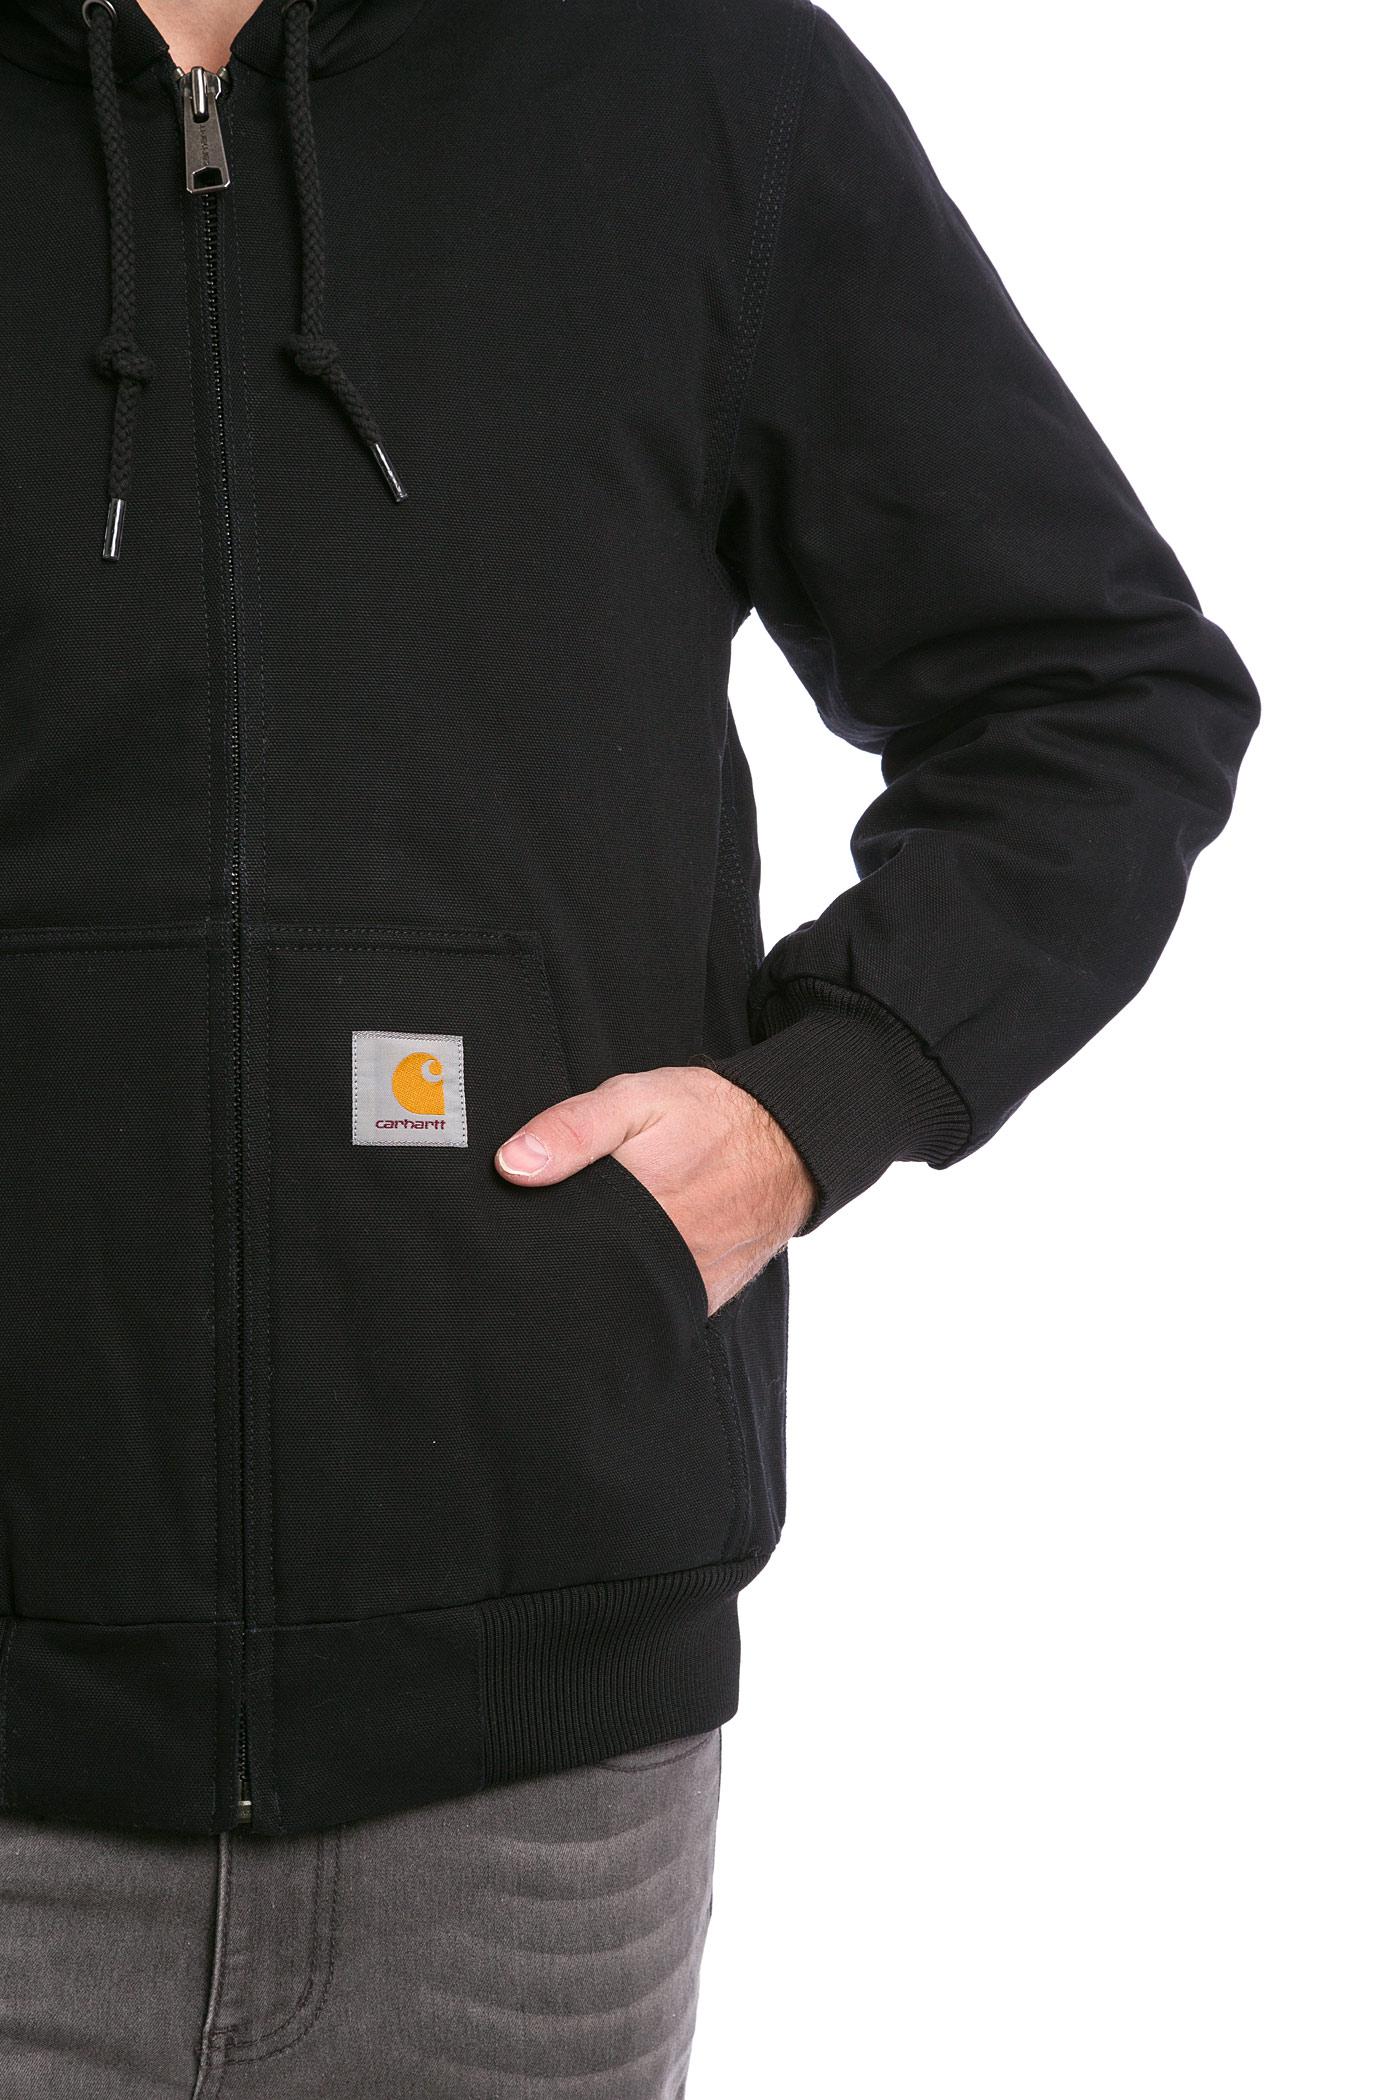 Where to buy a carhartt jacket